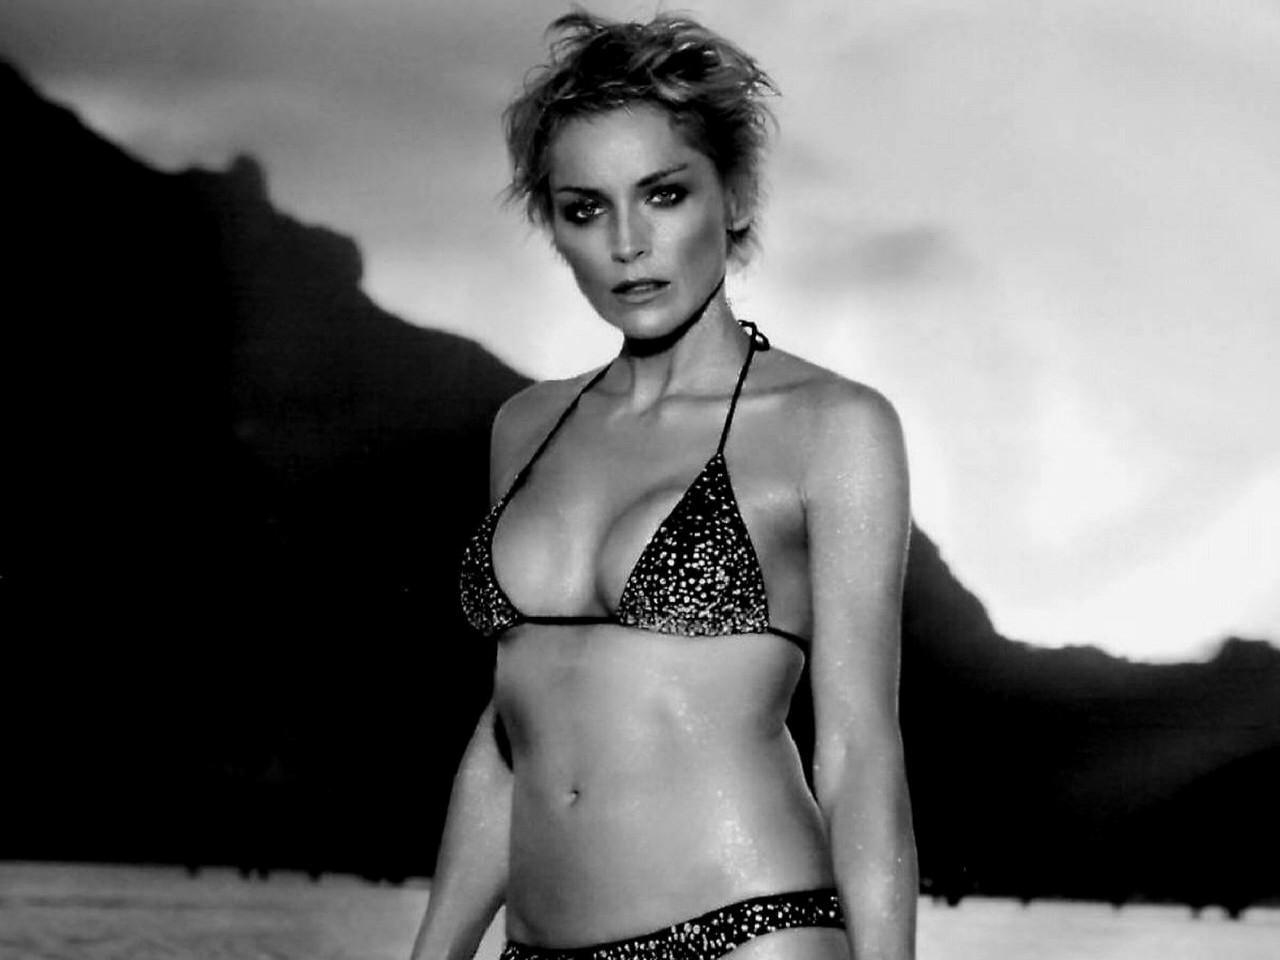 Wallpaper di Sharon Stone, splendida sirena in bikini